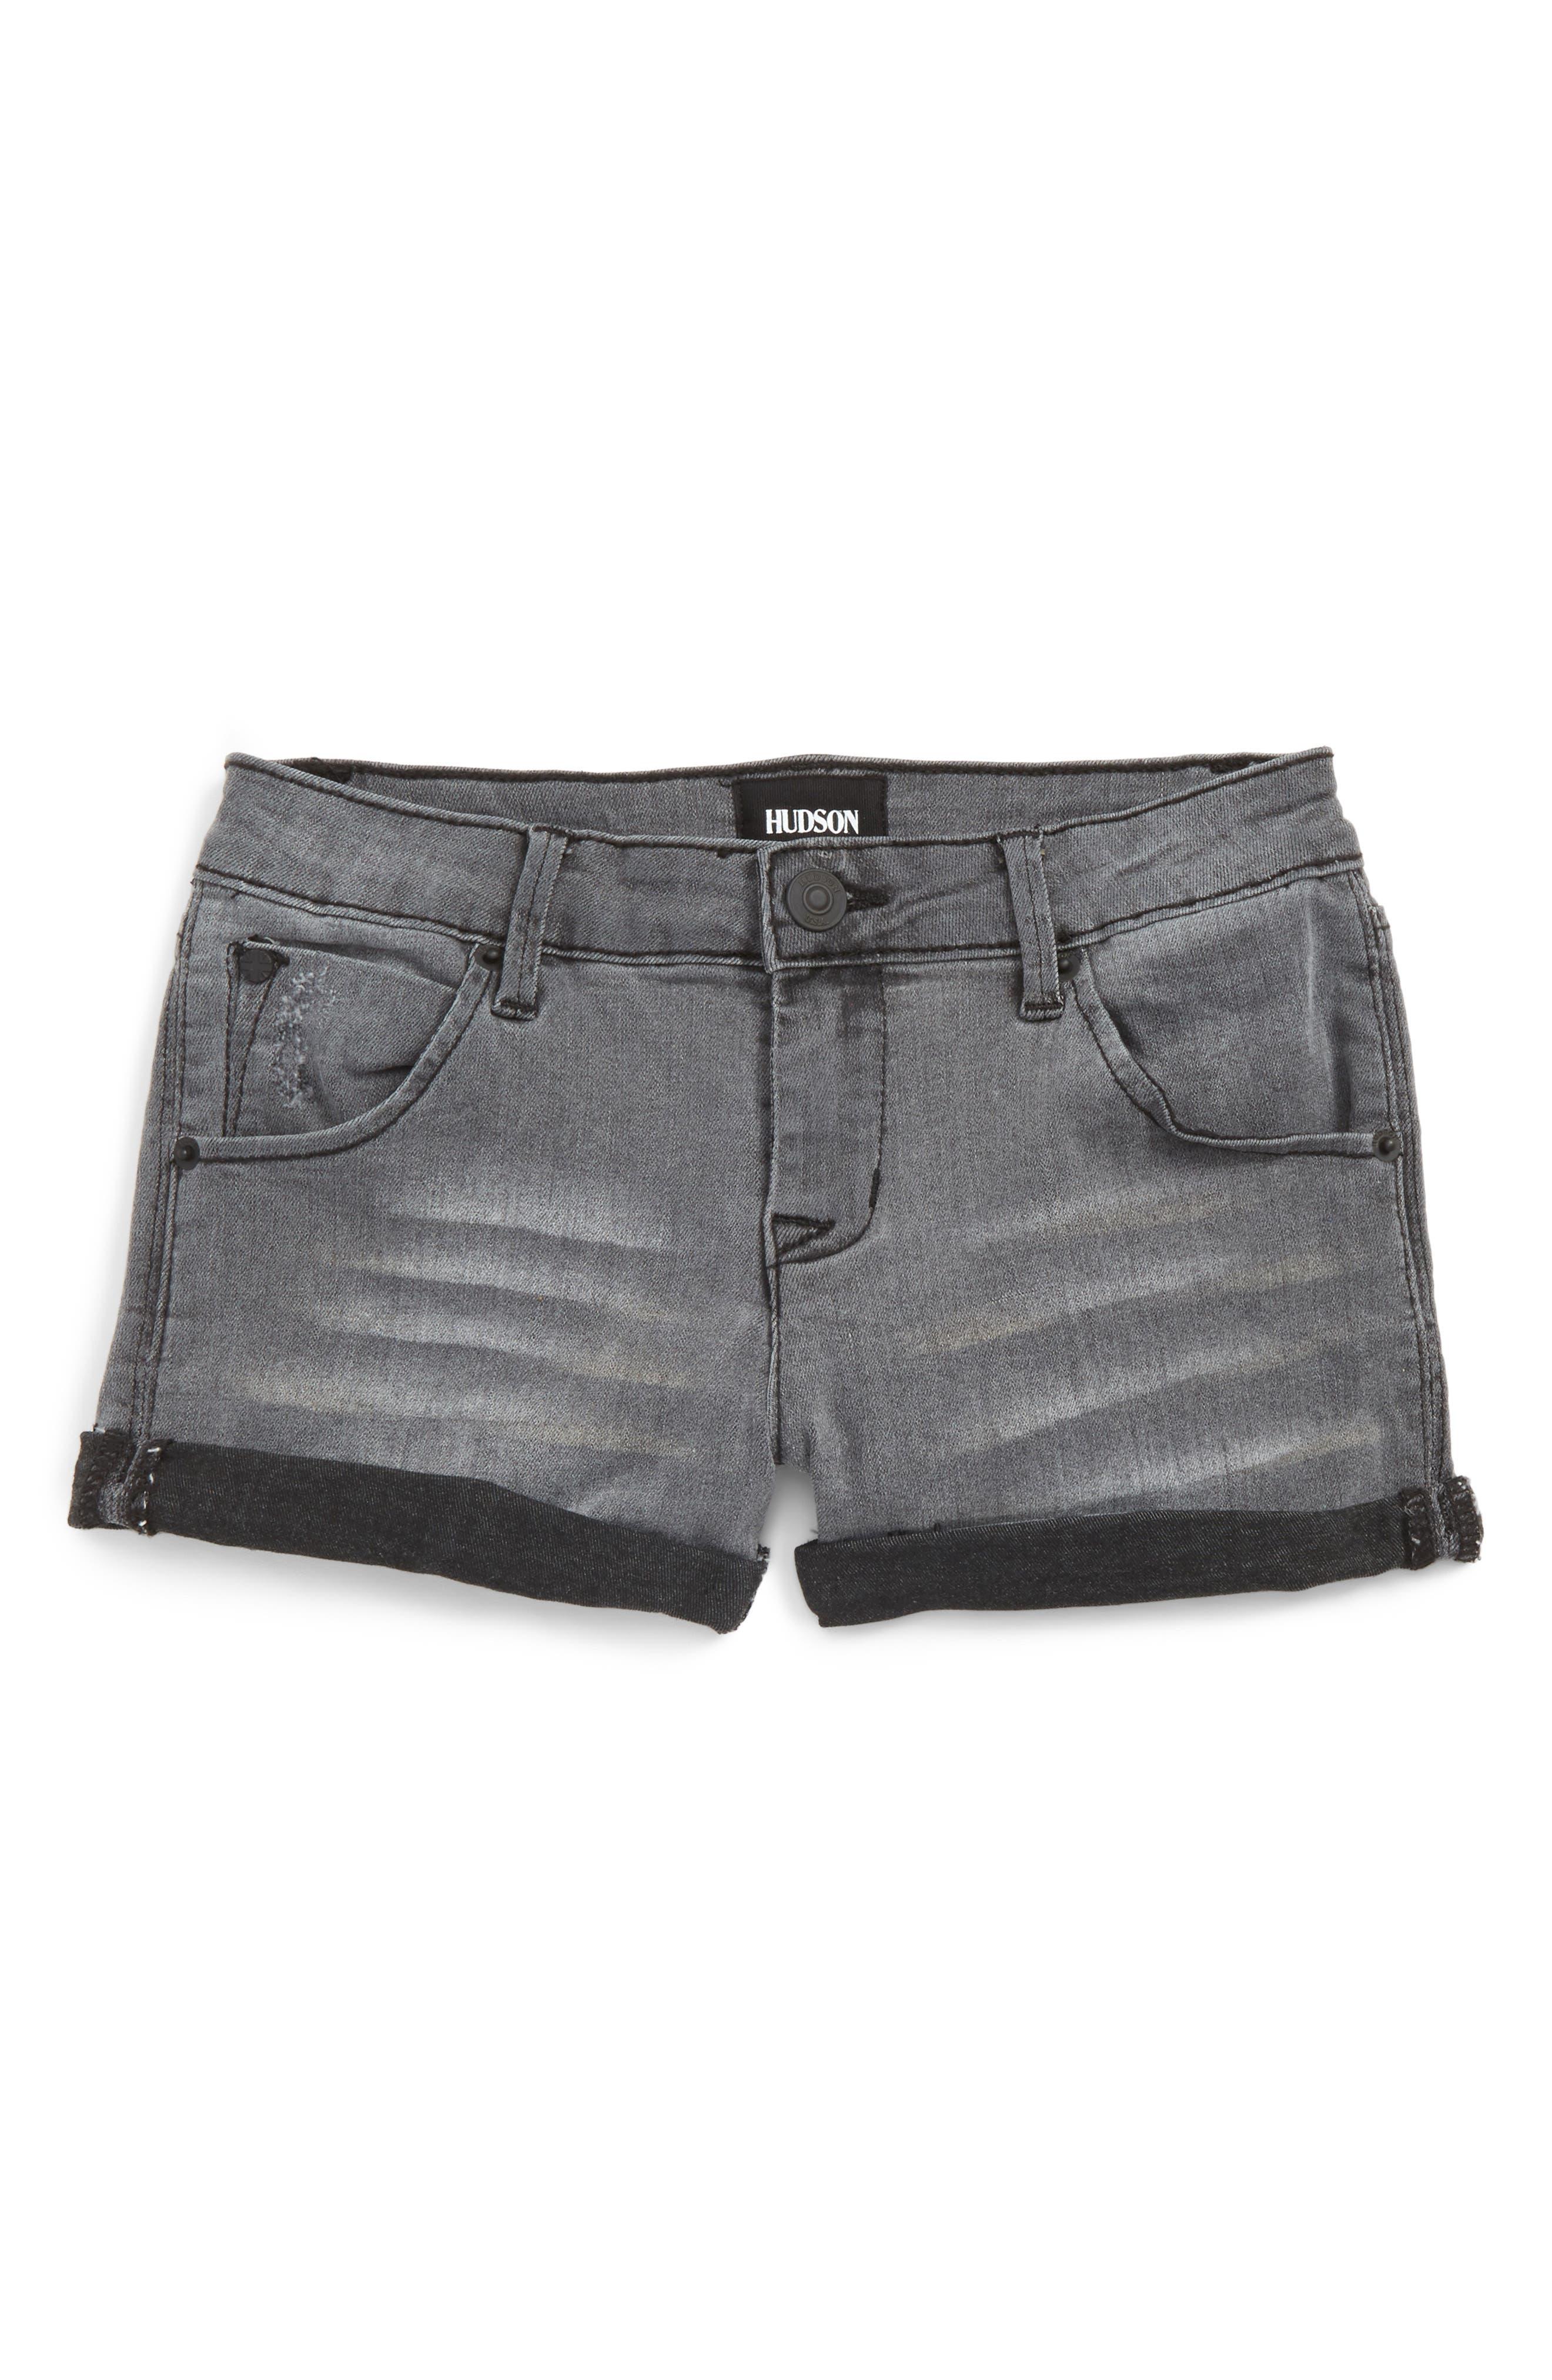 Alternate Image 1 Selected - Hudson Kids Roll Cuff Denim Shorts (Big Girls)